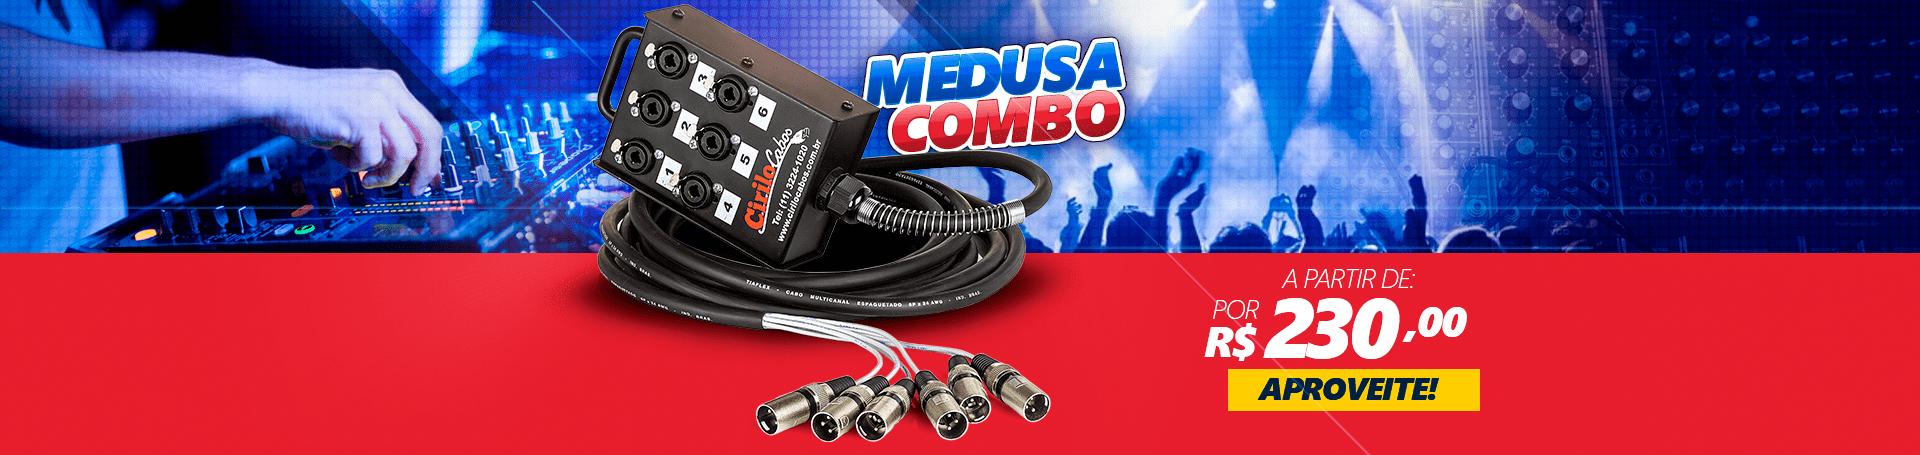 Medusa 6 Vias com Conectores Combo - Cirilo Cabos